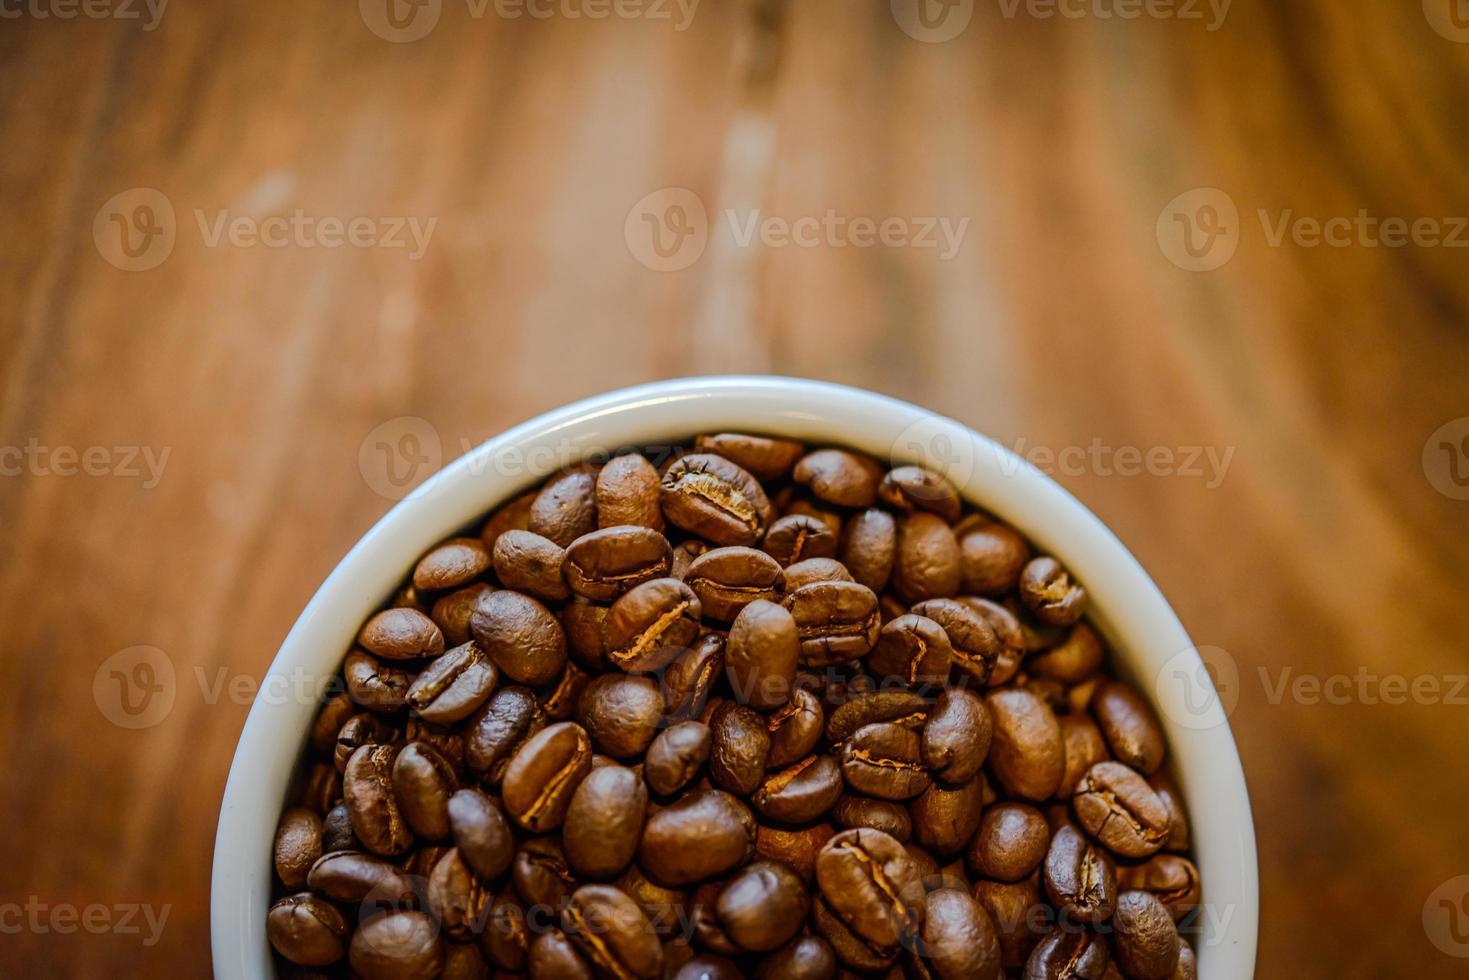 Granos de café en copa sobre fondo de madera grunge foto